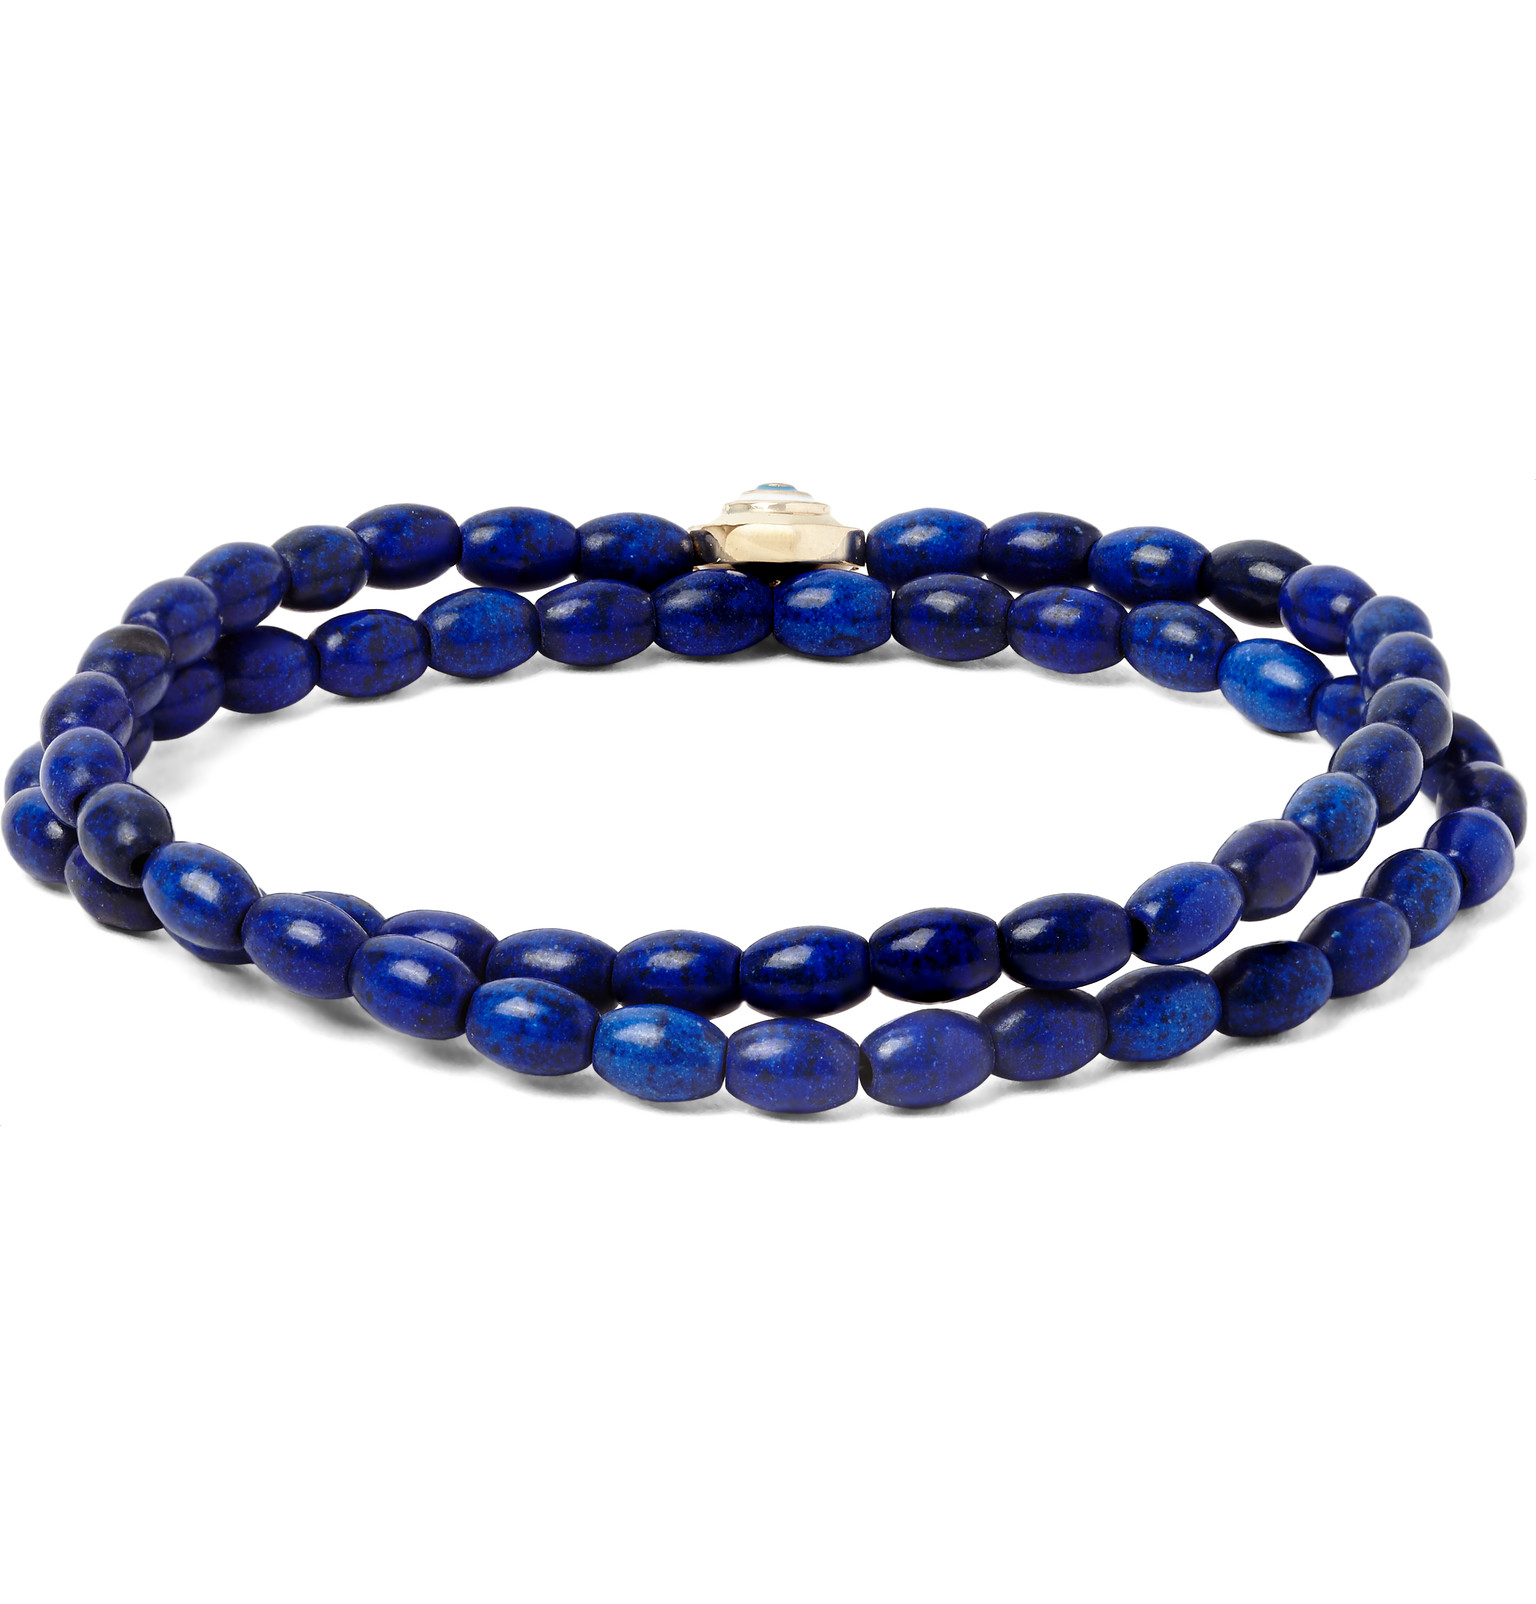 Luis Morais 14-karat Gold, Turquoise And Wood Bead Bracelet - Blue